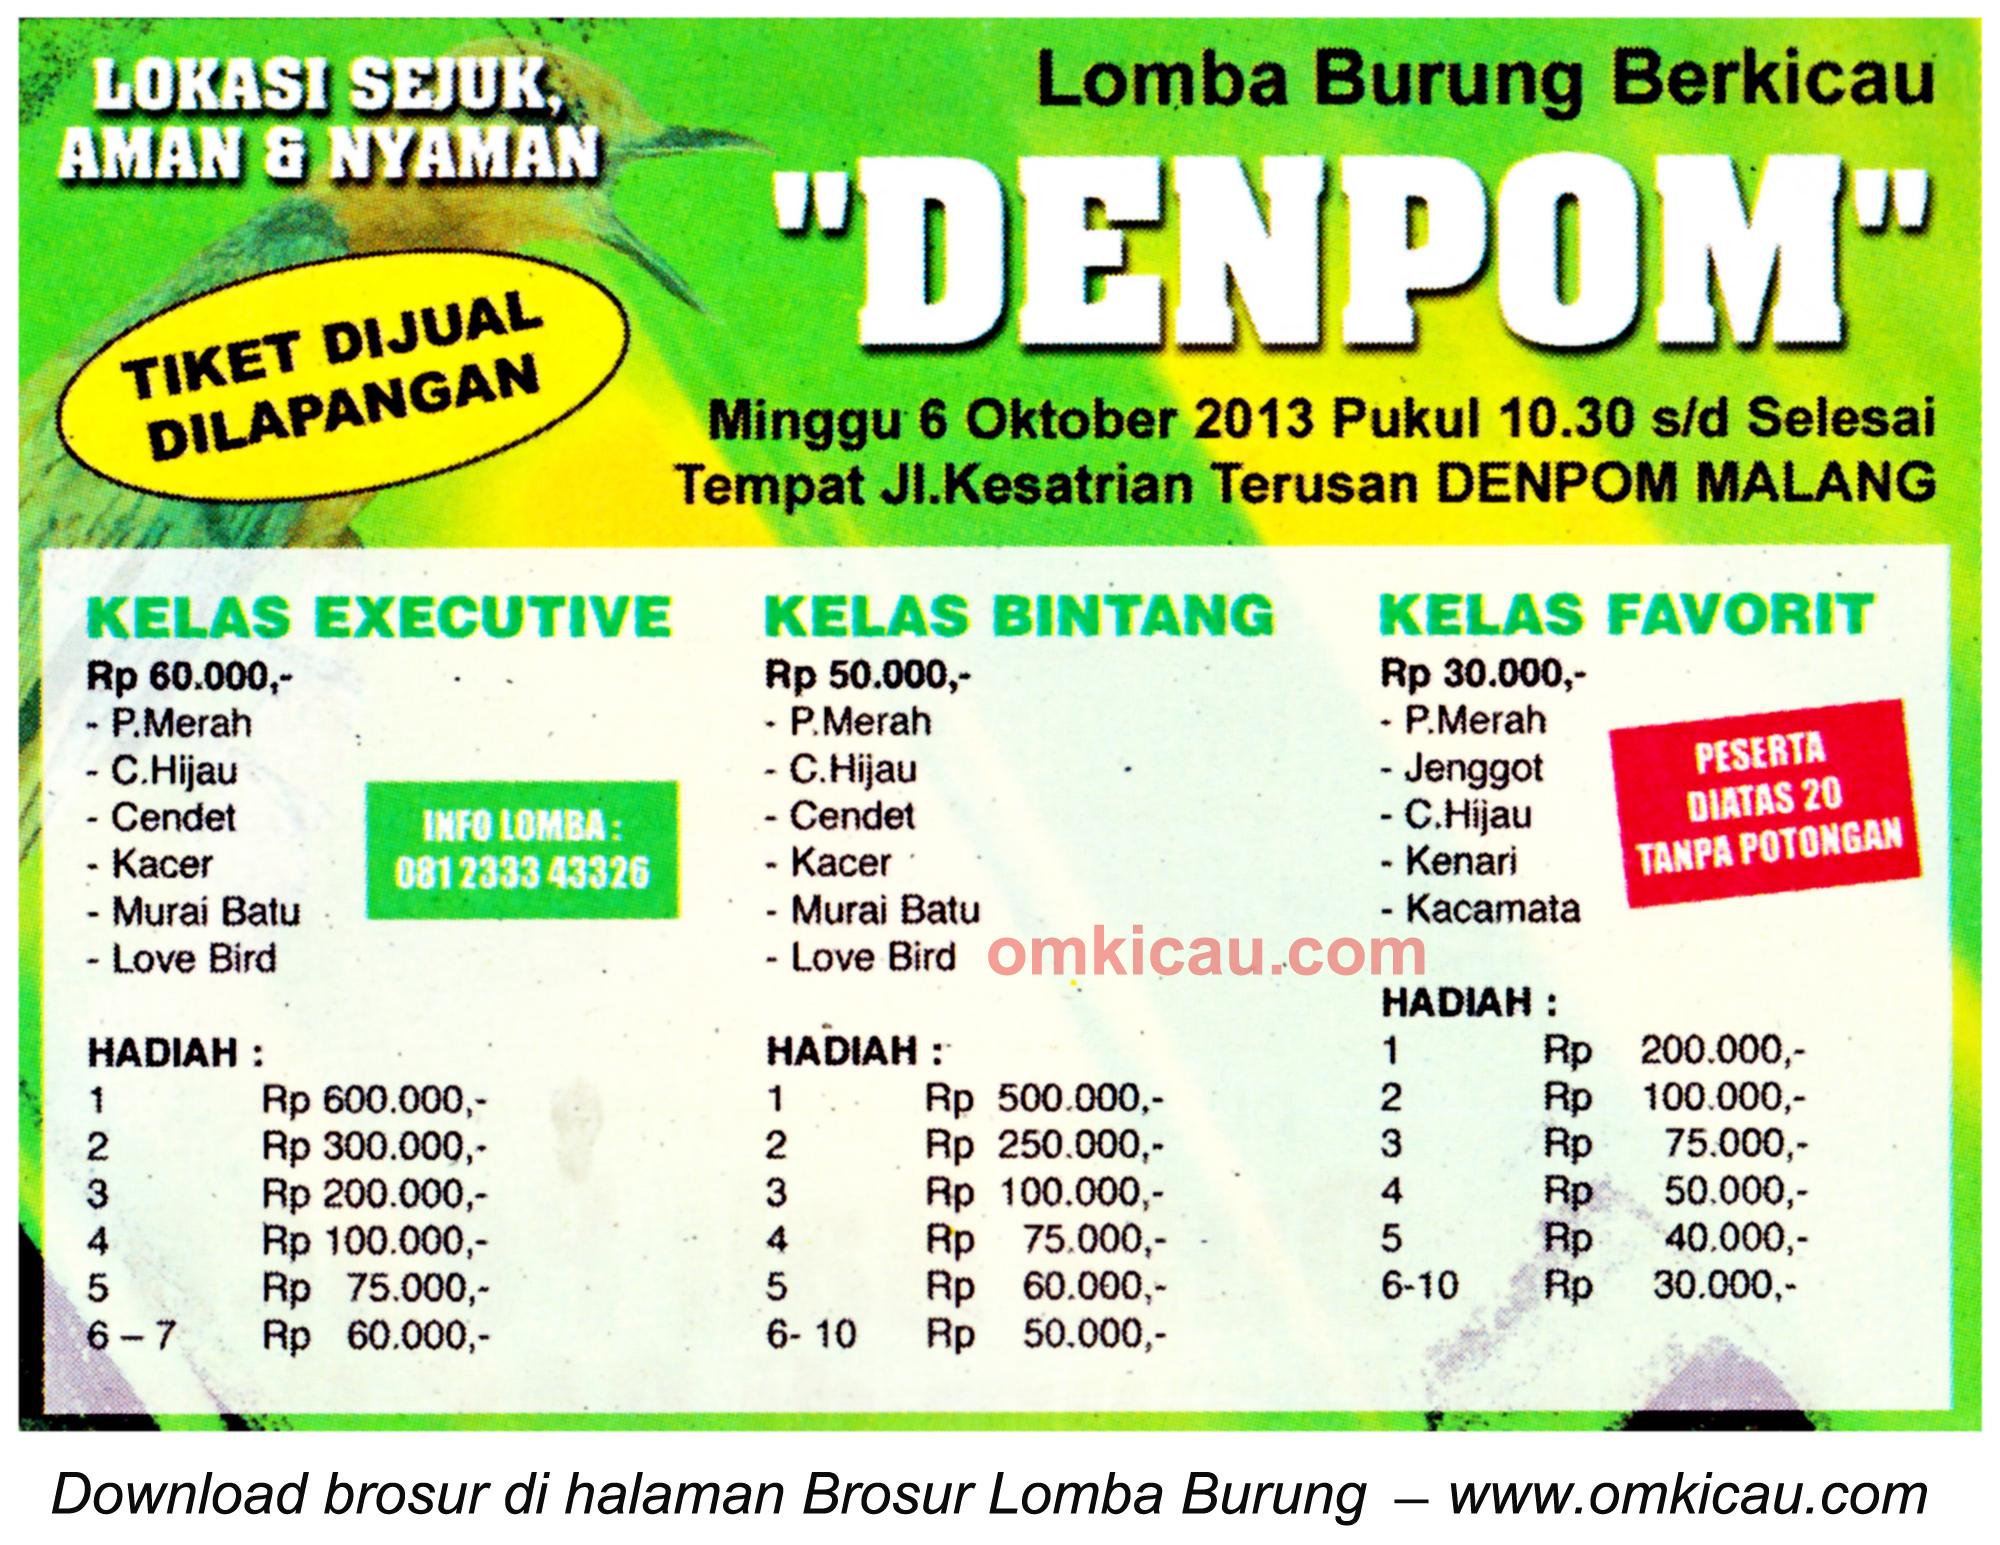 Brosur Lomba Burung Berkicau Denpom, Malang, 6 Oktober 2013